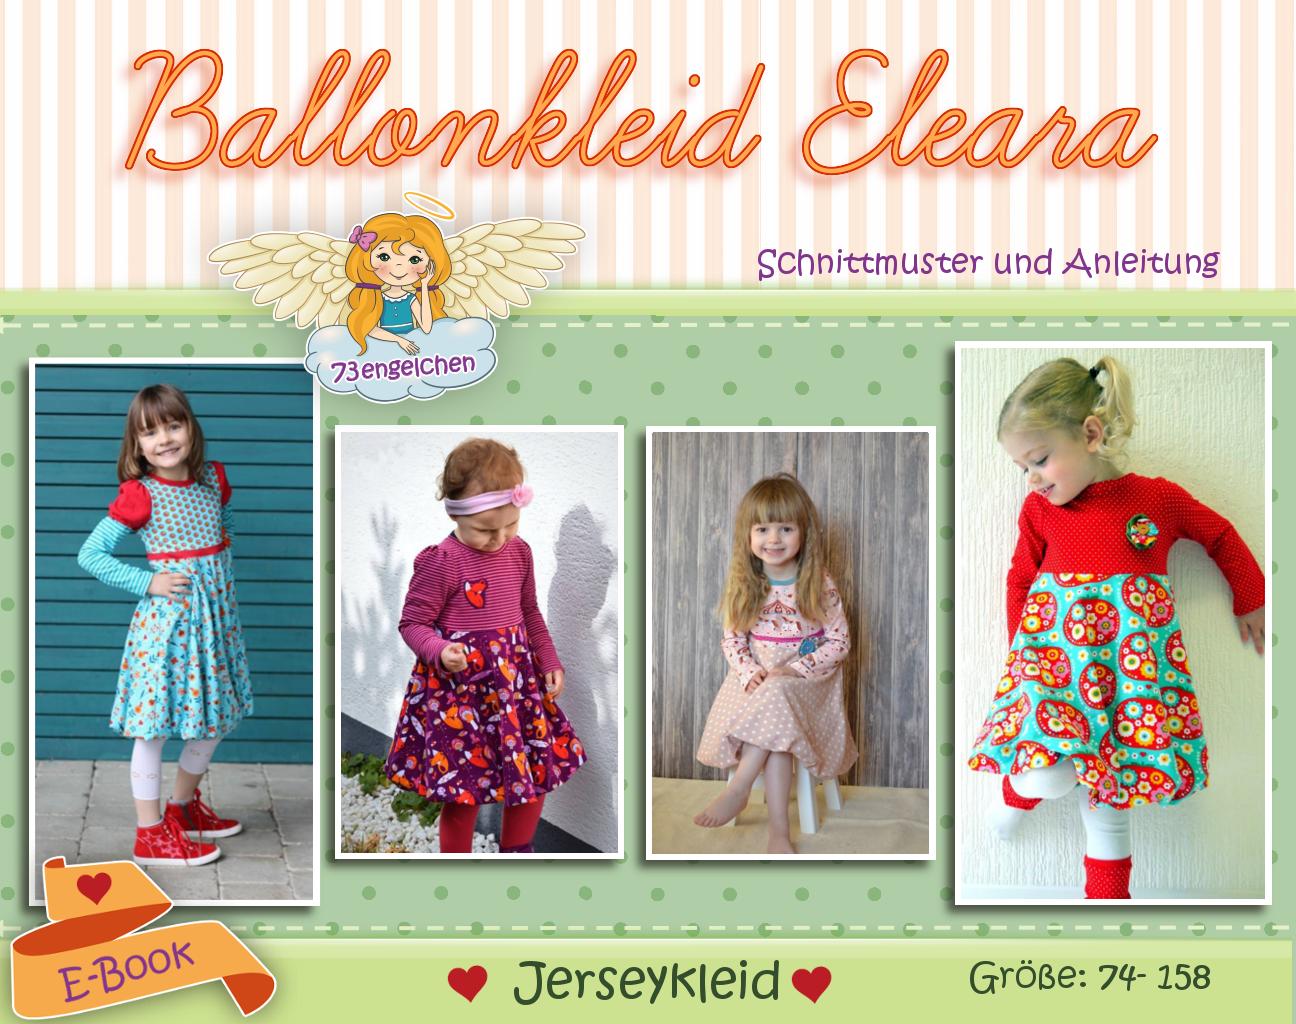 Ballonkleid Eleara - Jersey Variante